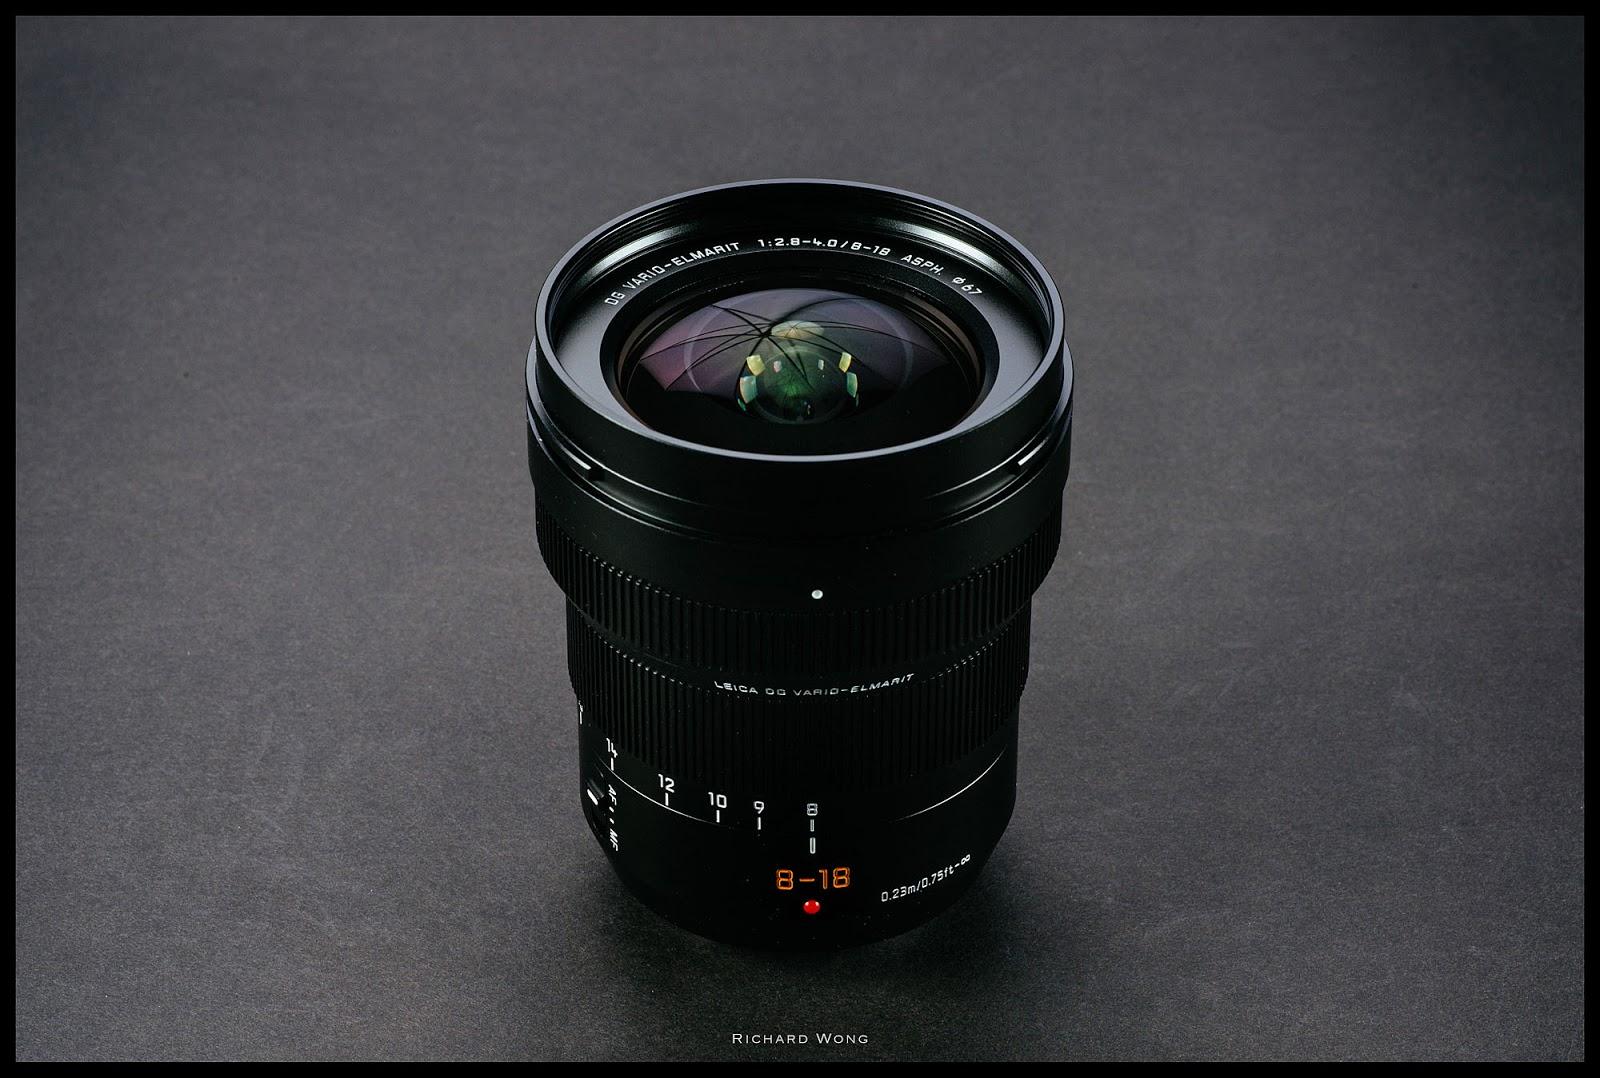 Leica DG Vario-Elmarit 8-18mm f/2.8-4.0 Asph, вид сверху